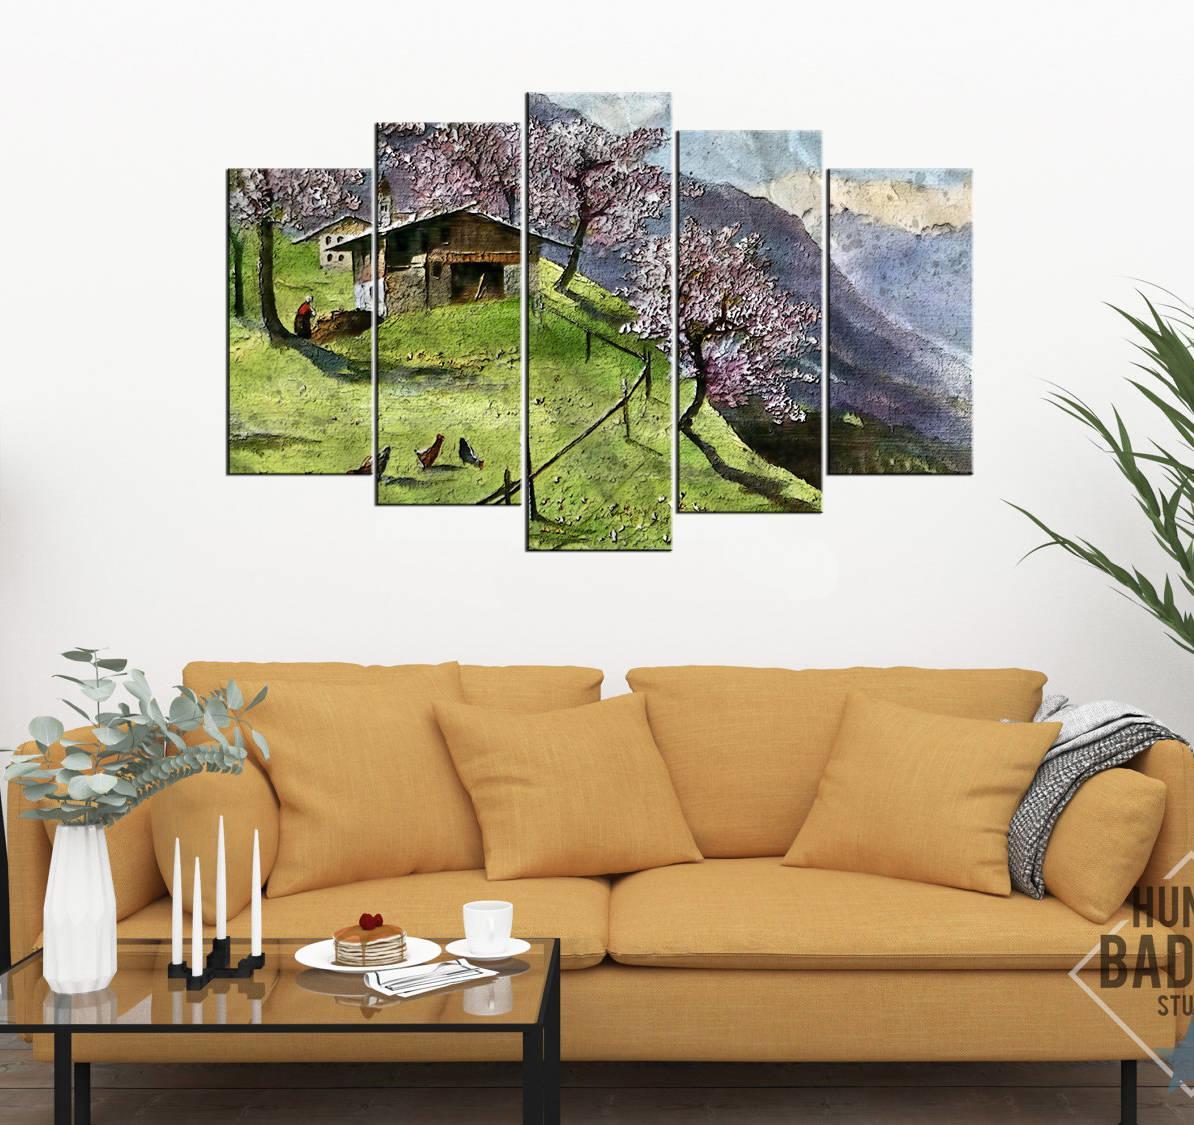 Dağ Evi Manzaralı 5 Parçalı Mdf Tablo-3564